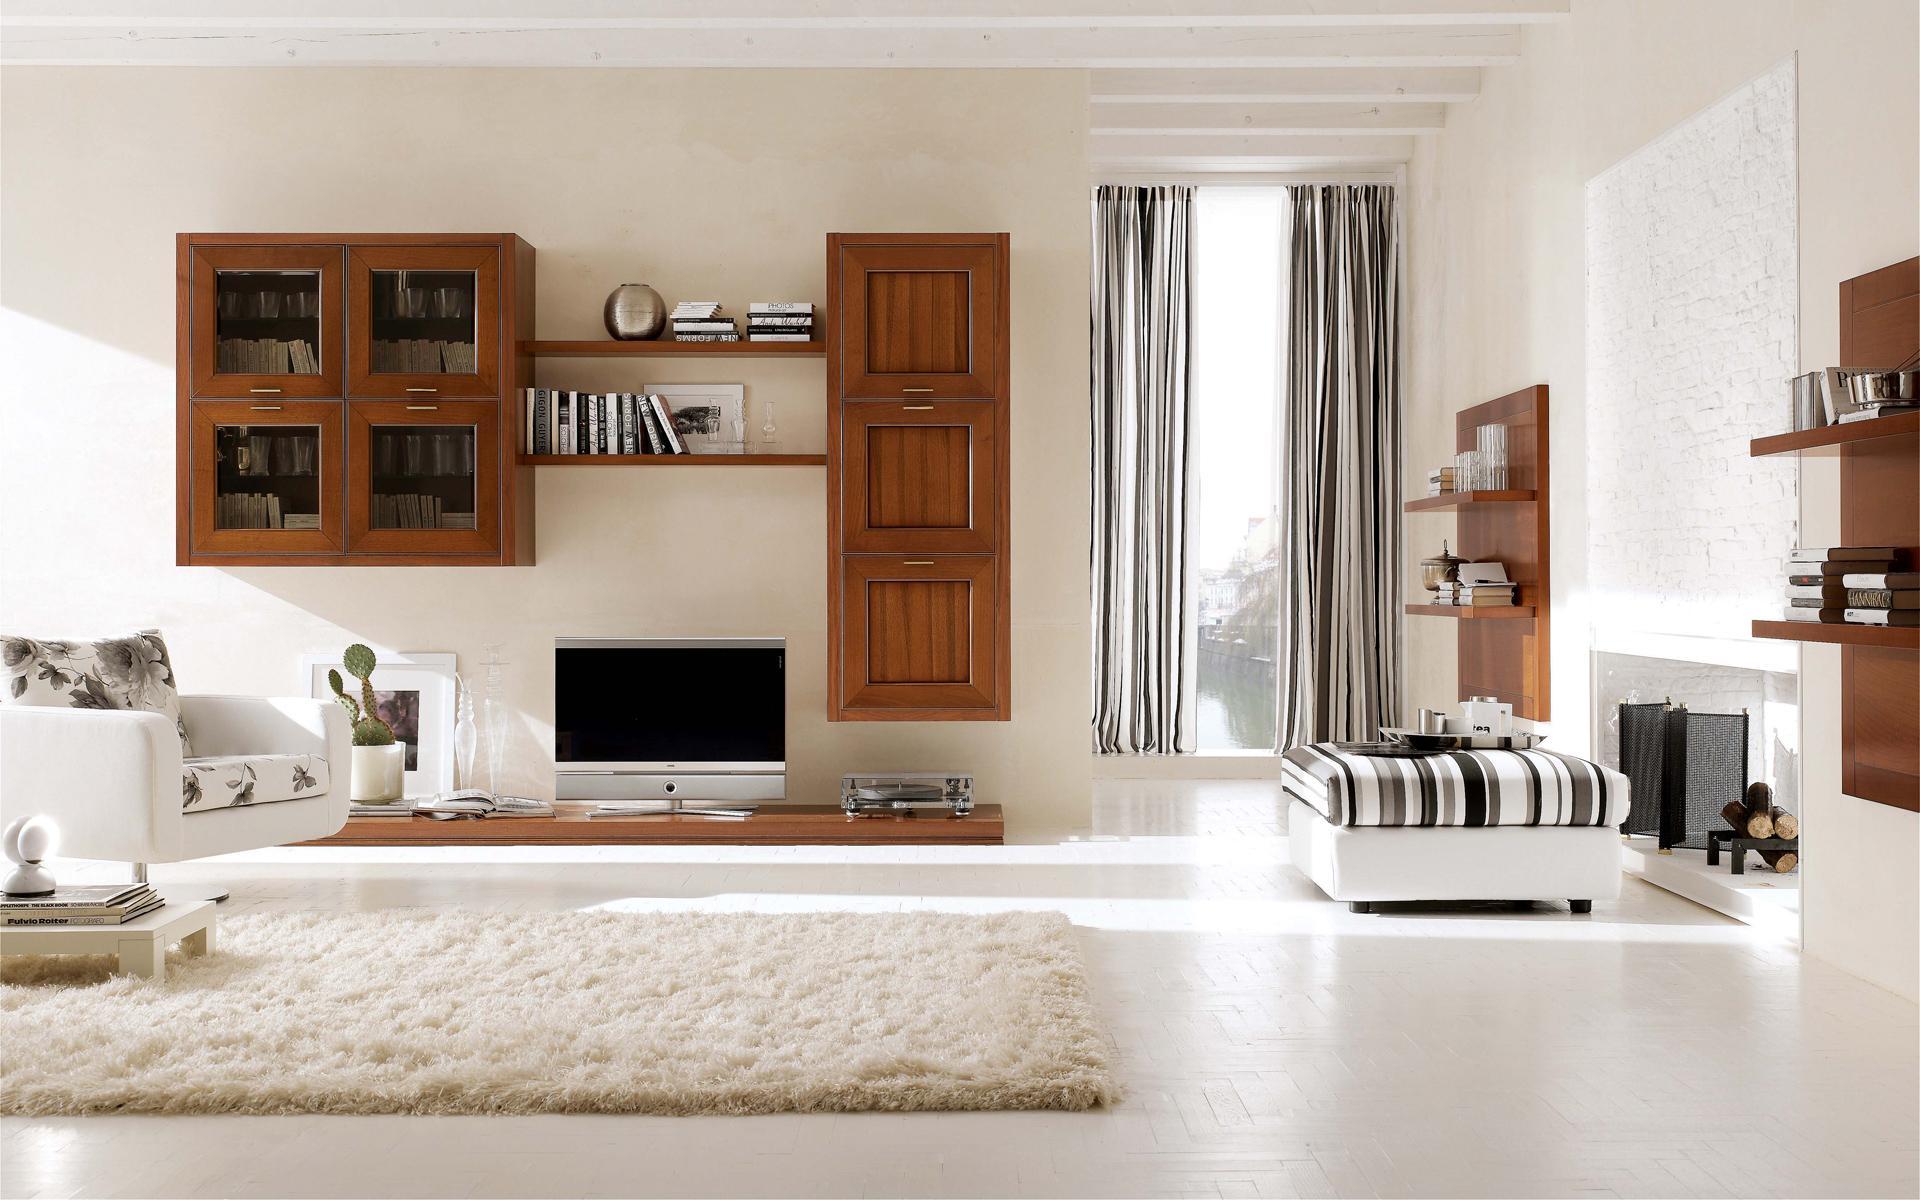 http://www.herminabau.hu/images/happyland2/uj/happyUjKep8.jpg